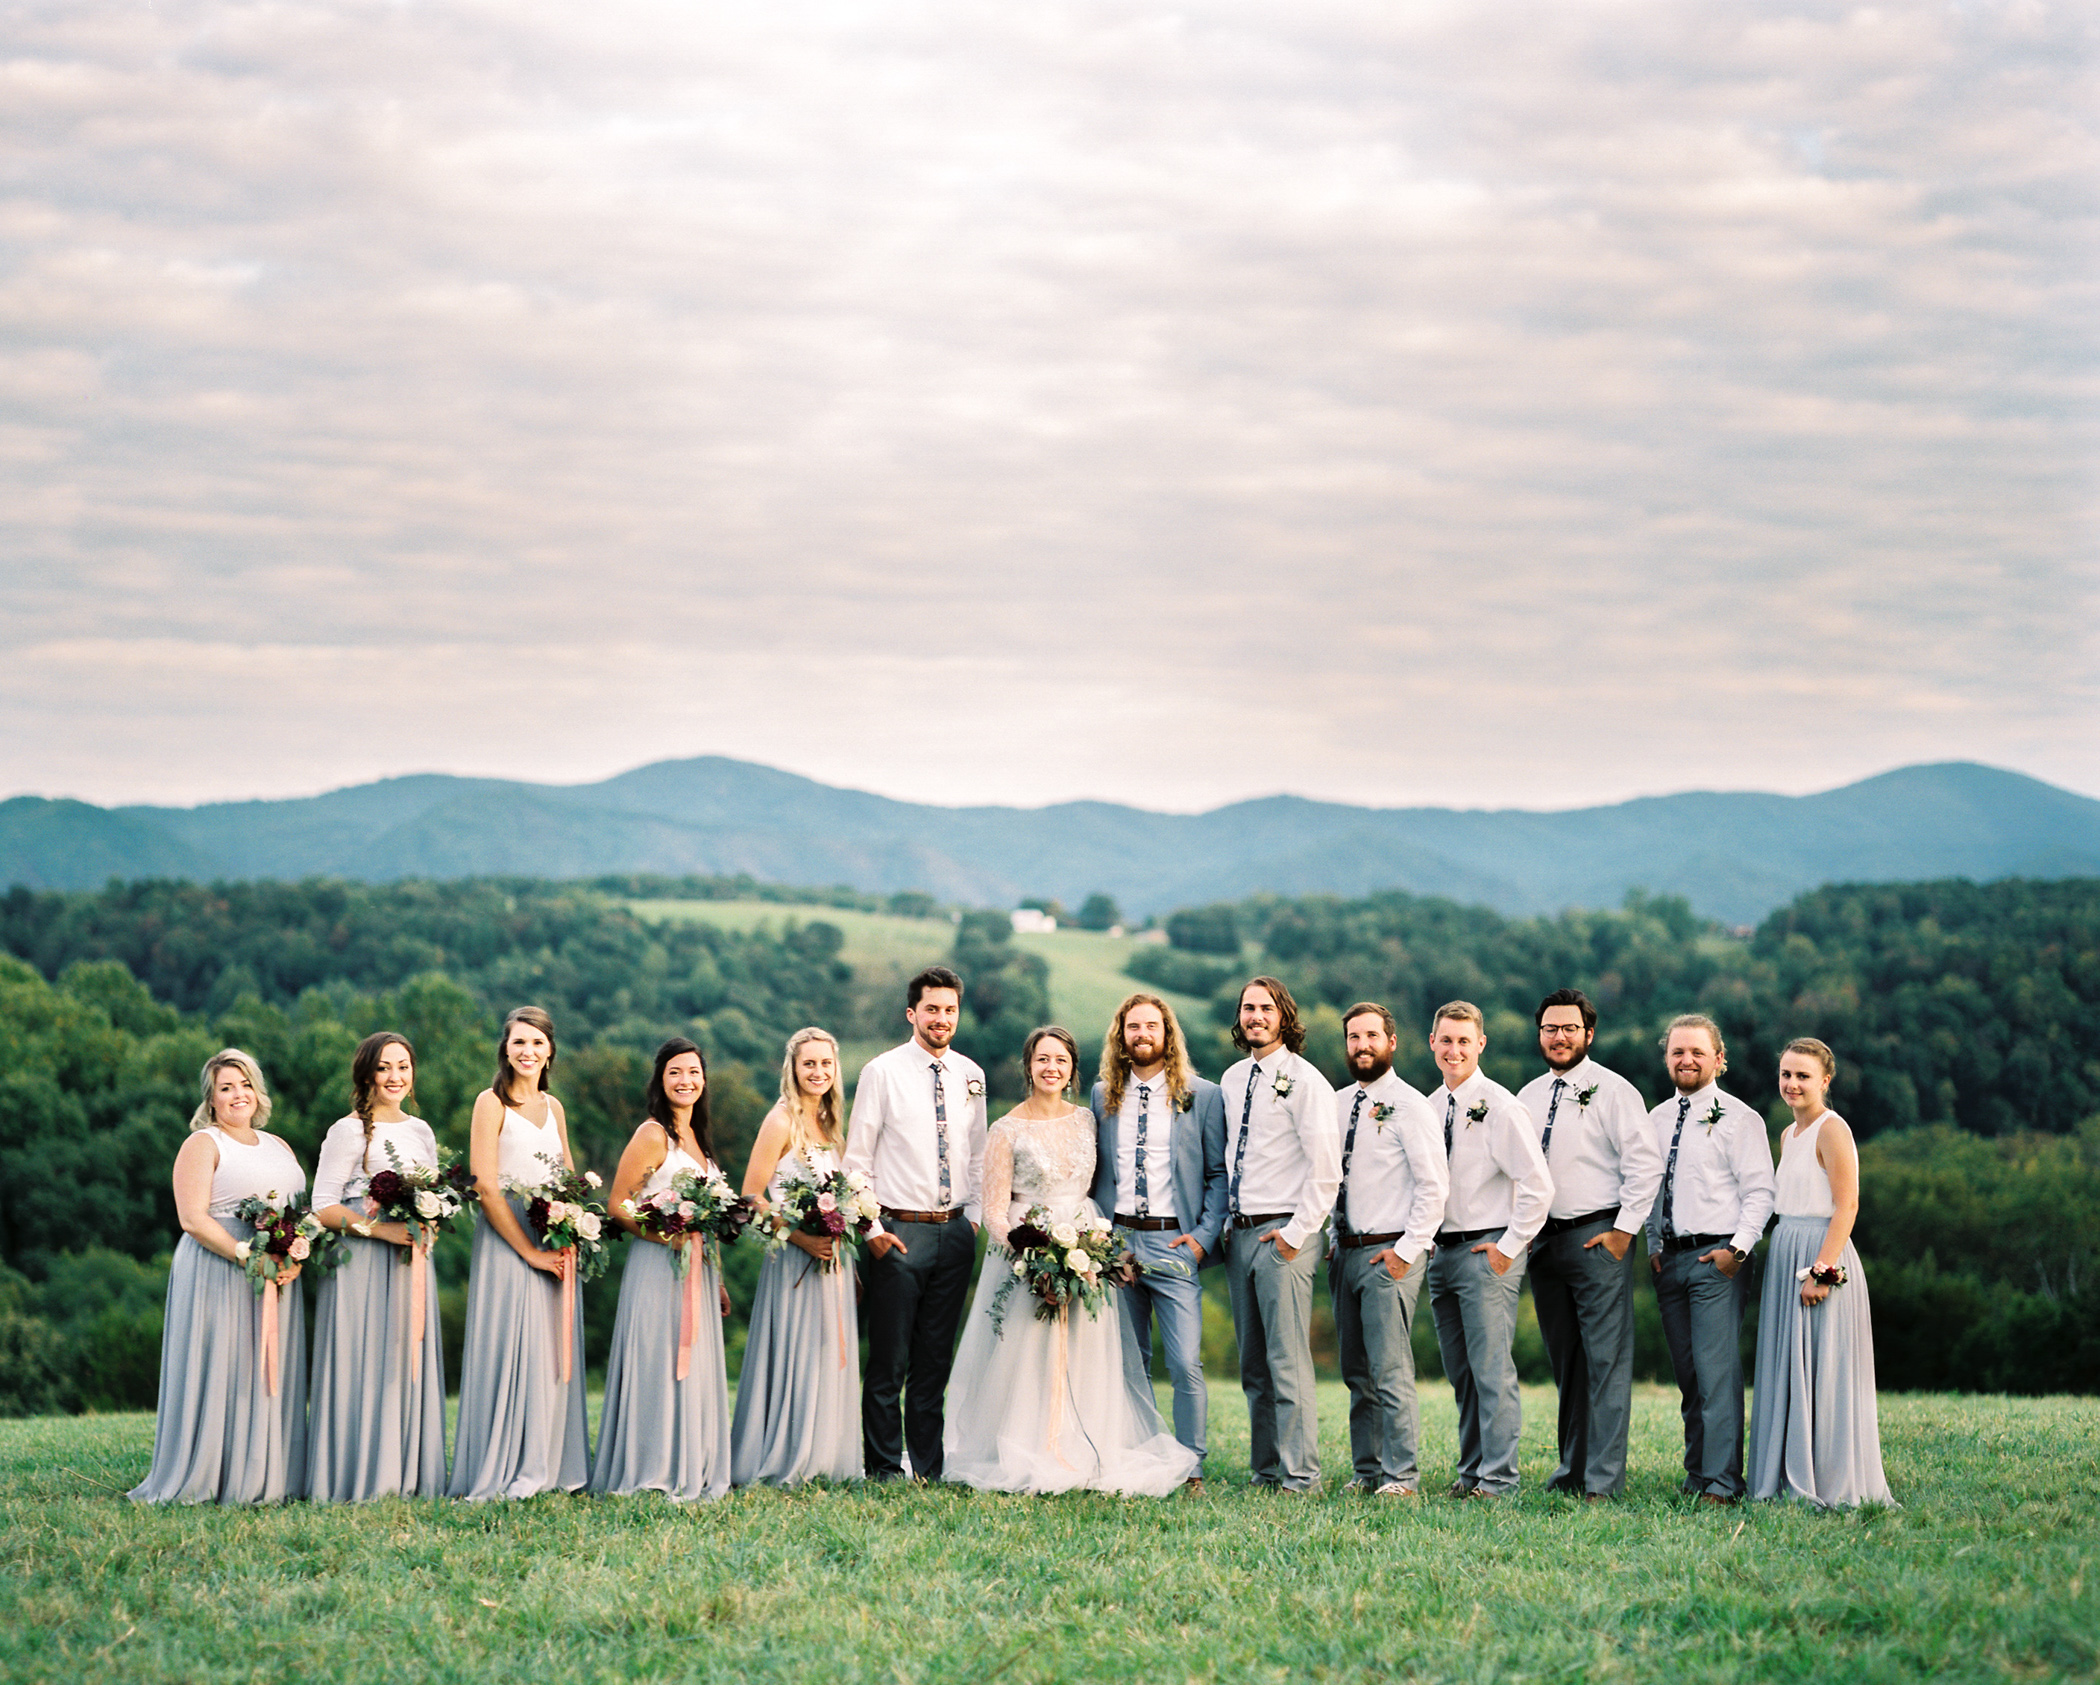 Charlotte-Film-Wedding_Photographer-heartstone-lodge-virginia-27.jpg